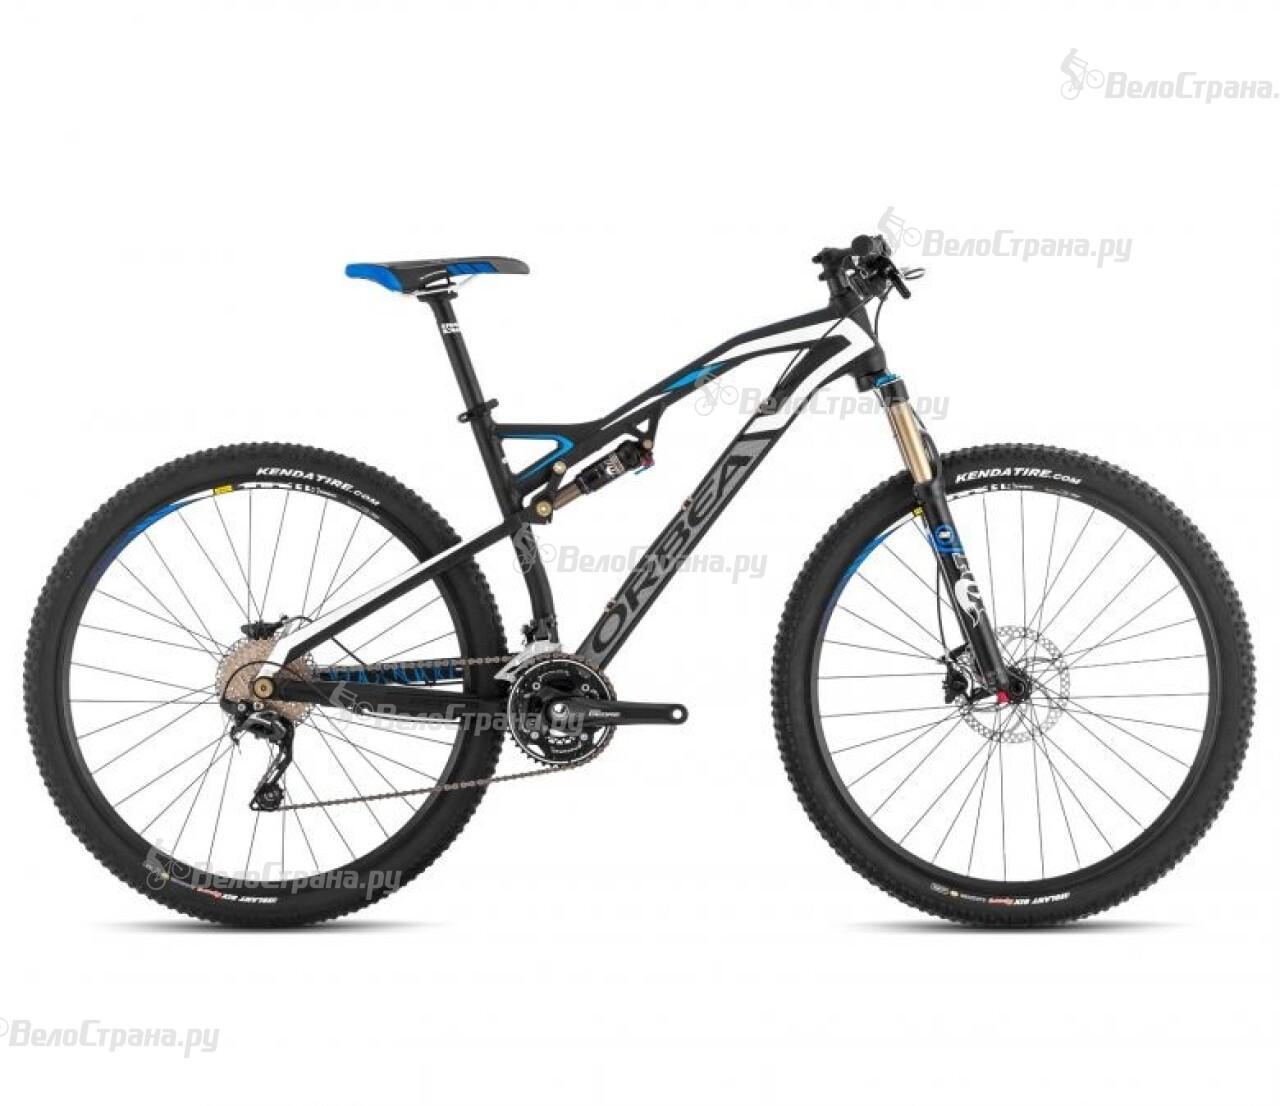 Велосипед Orbea Occam 29 H30 (2014) велосипед orbea travel h30 2014